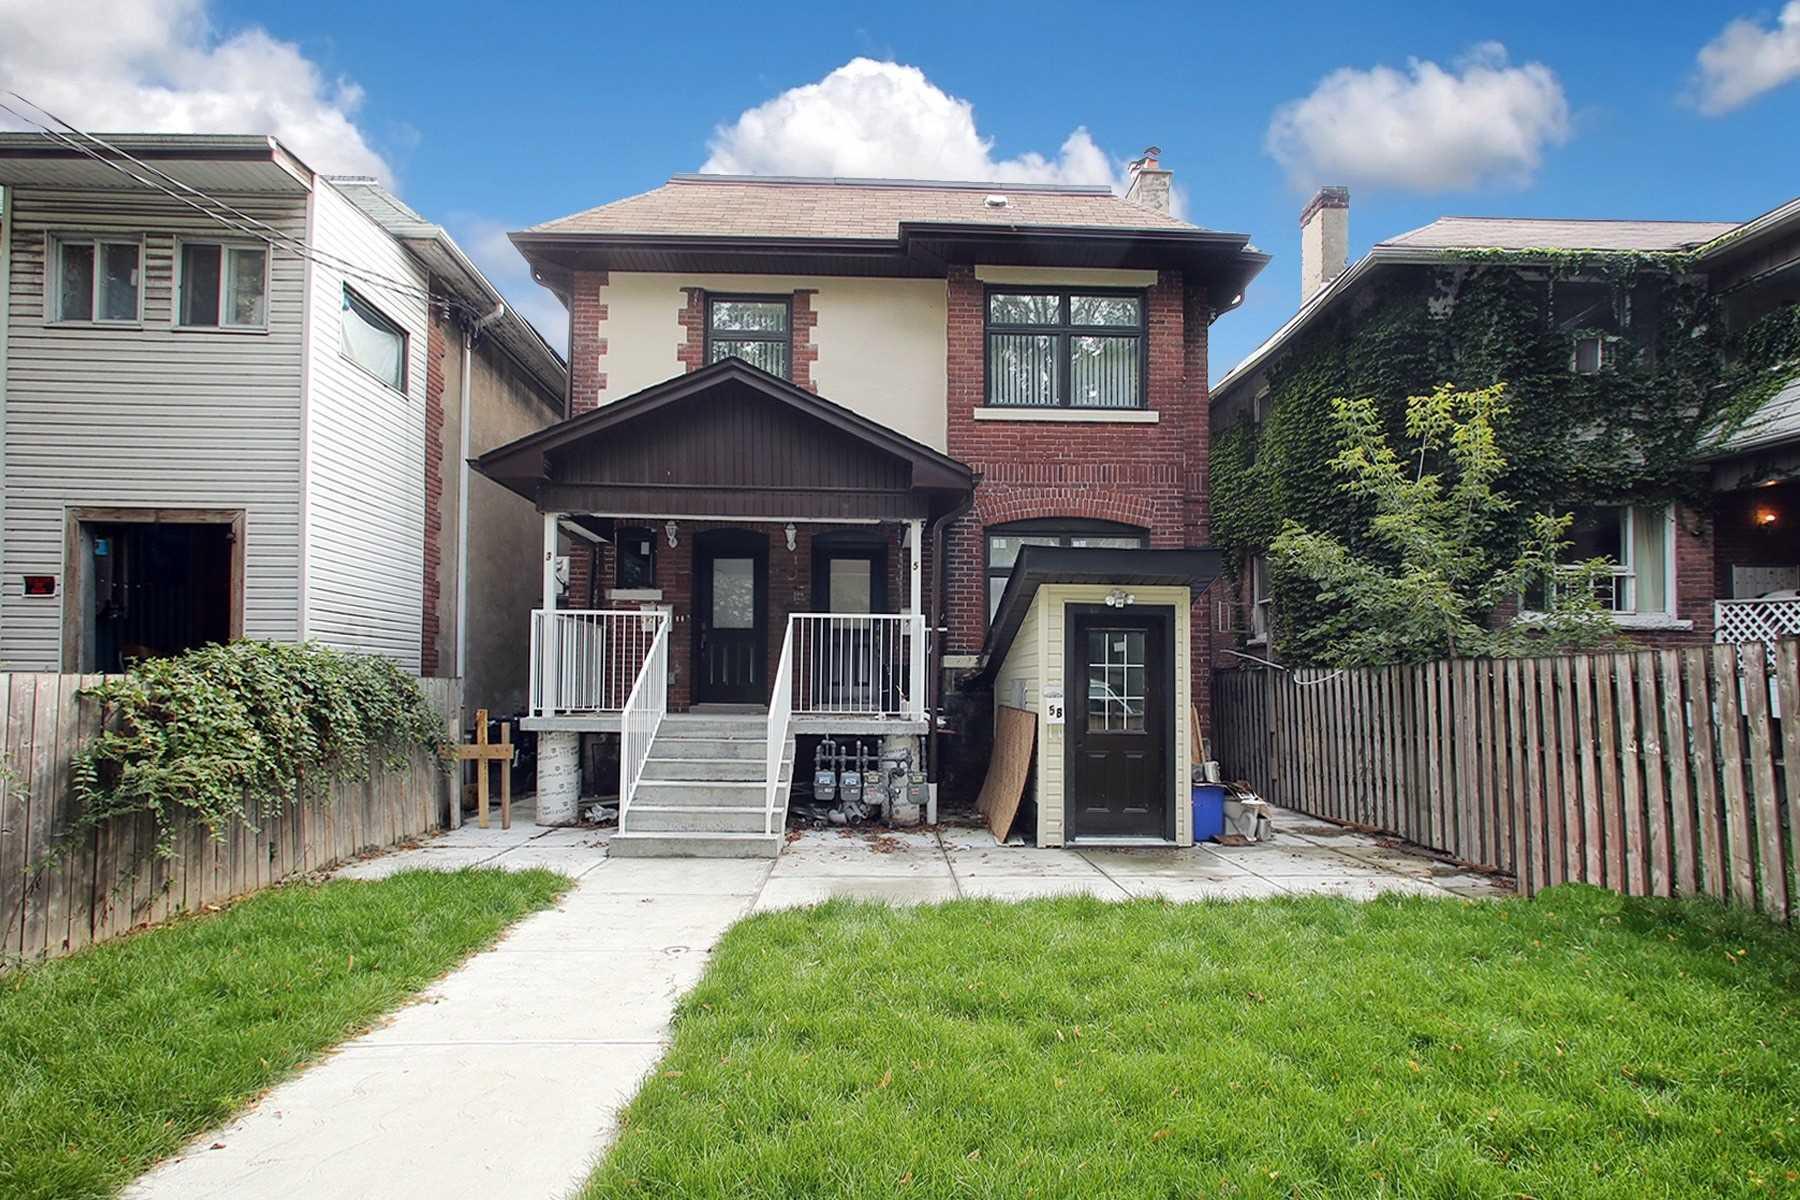 3, 5 Temple Ave, Toronto, Ontario M6K1C7, 9 Bedrooms Bedrooms, 18 Rooms Rooms,6 BathroomsBathrooms,Multiplex,For Sale,Temple,W5399076